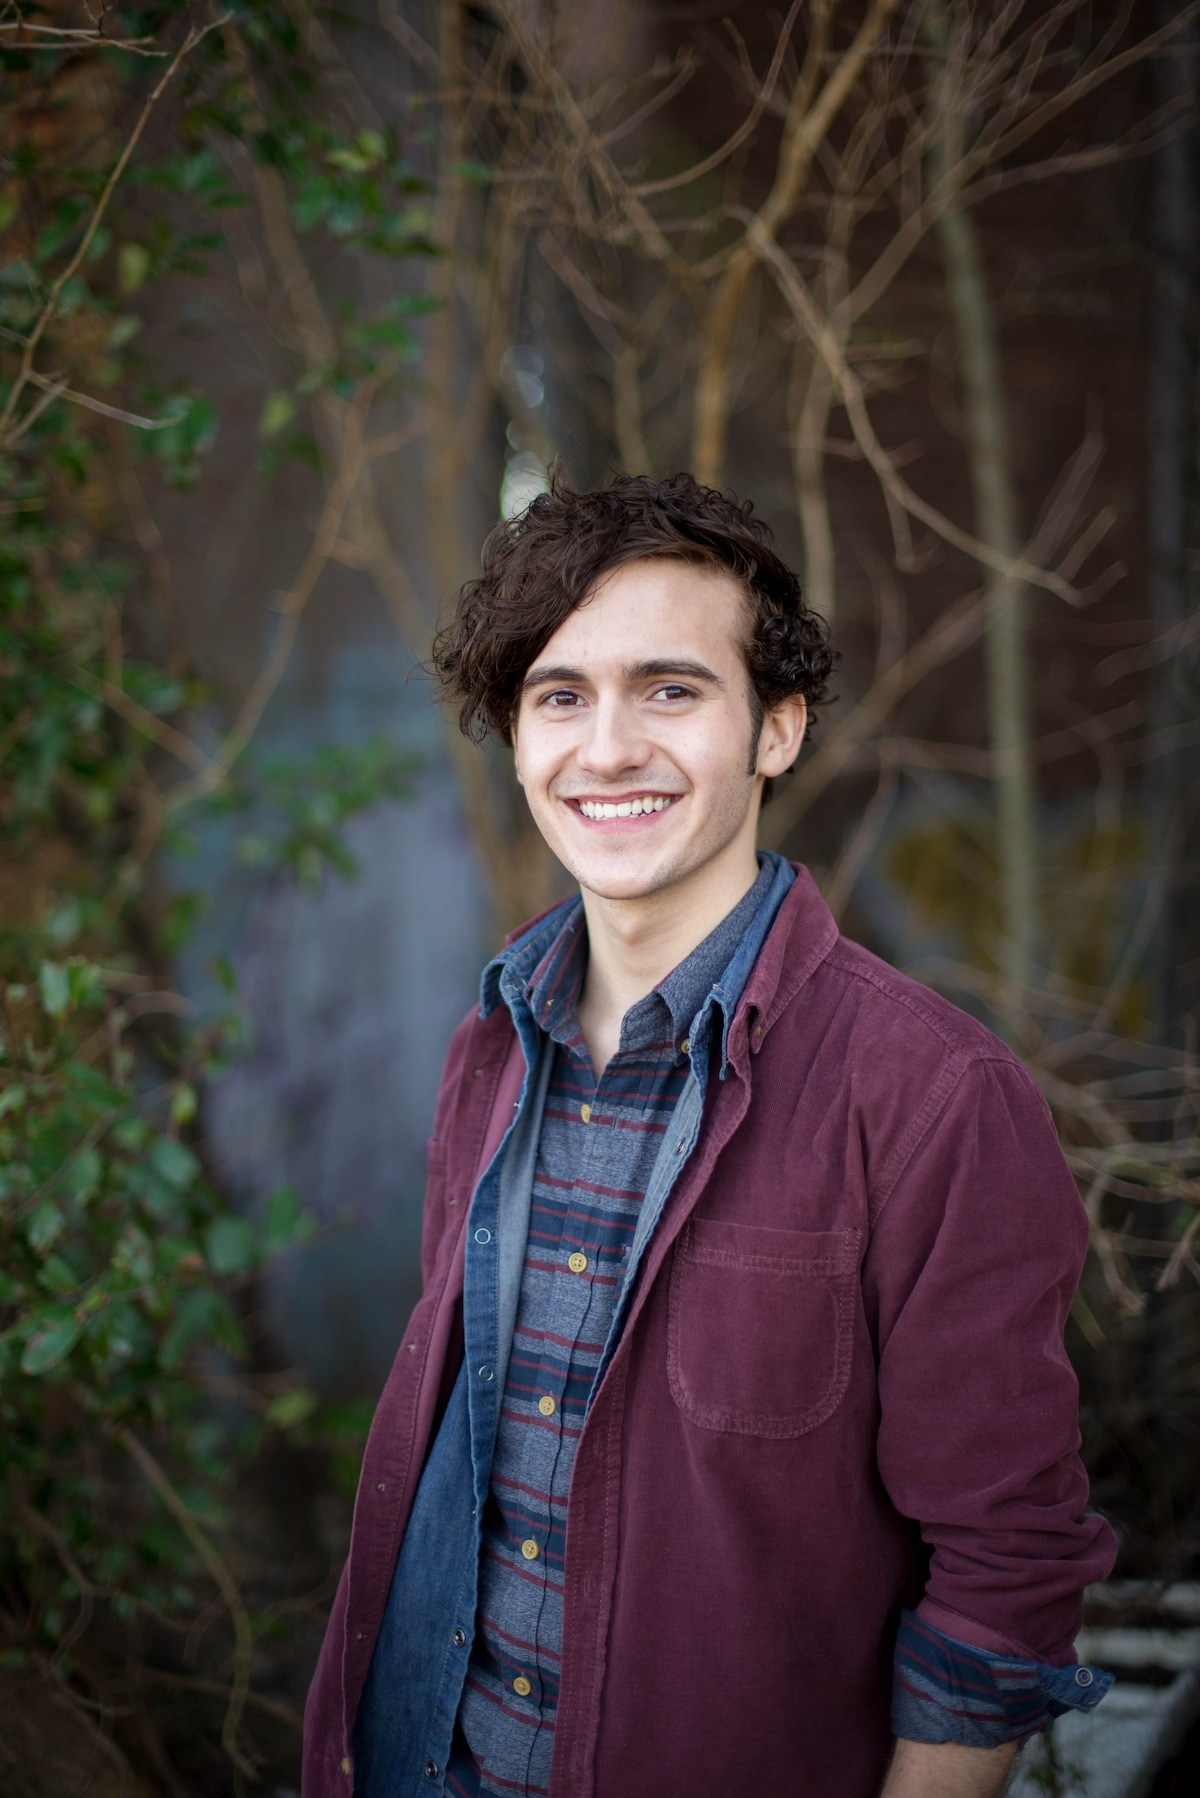 Matthew from Nashville